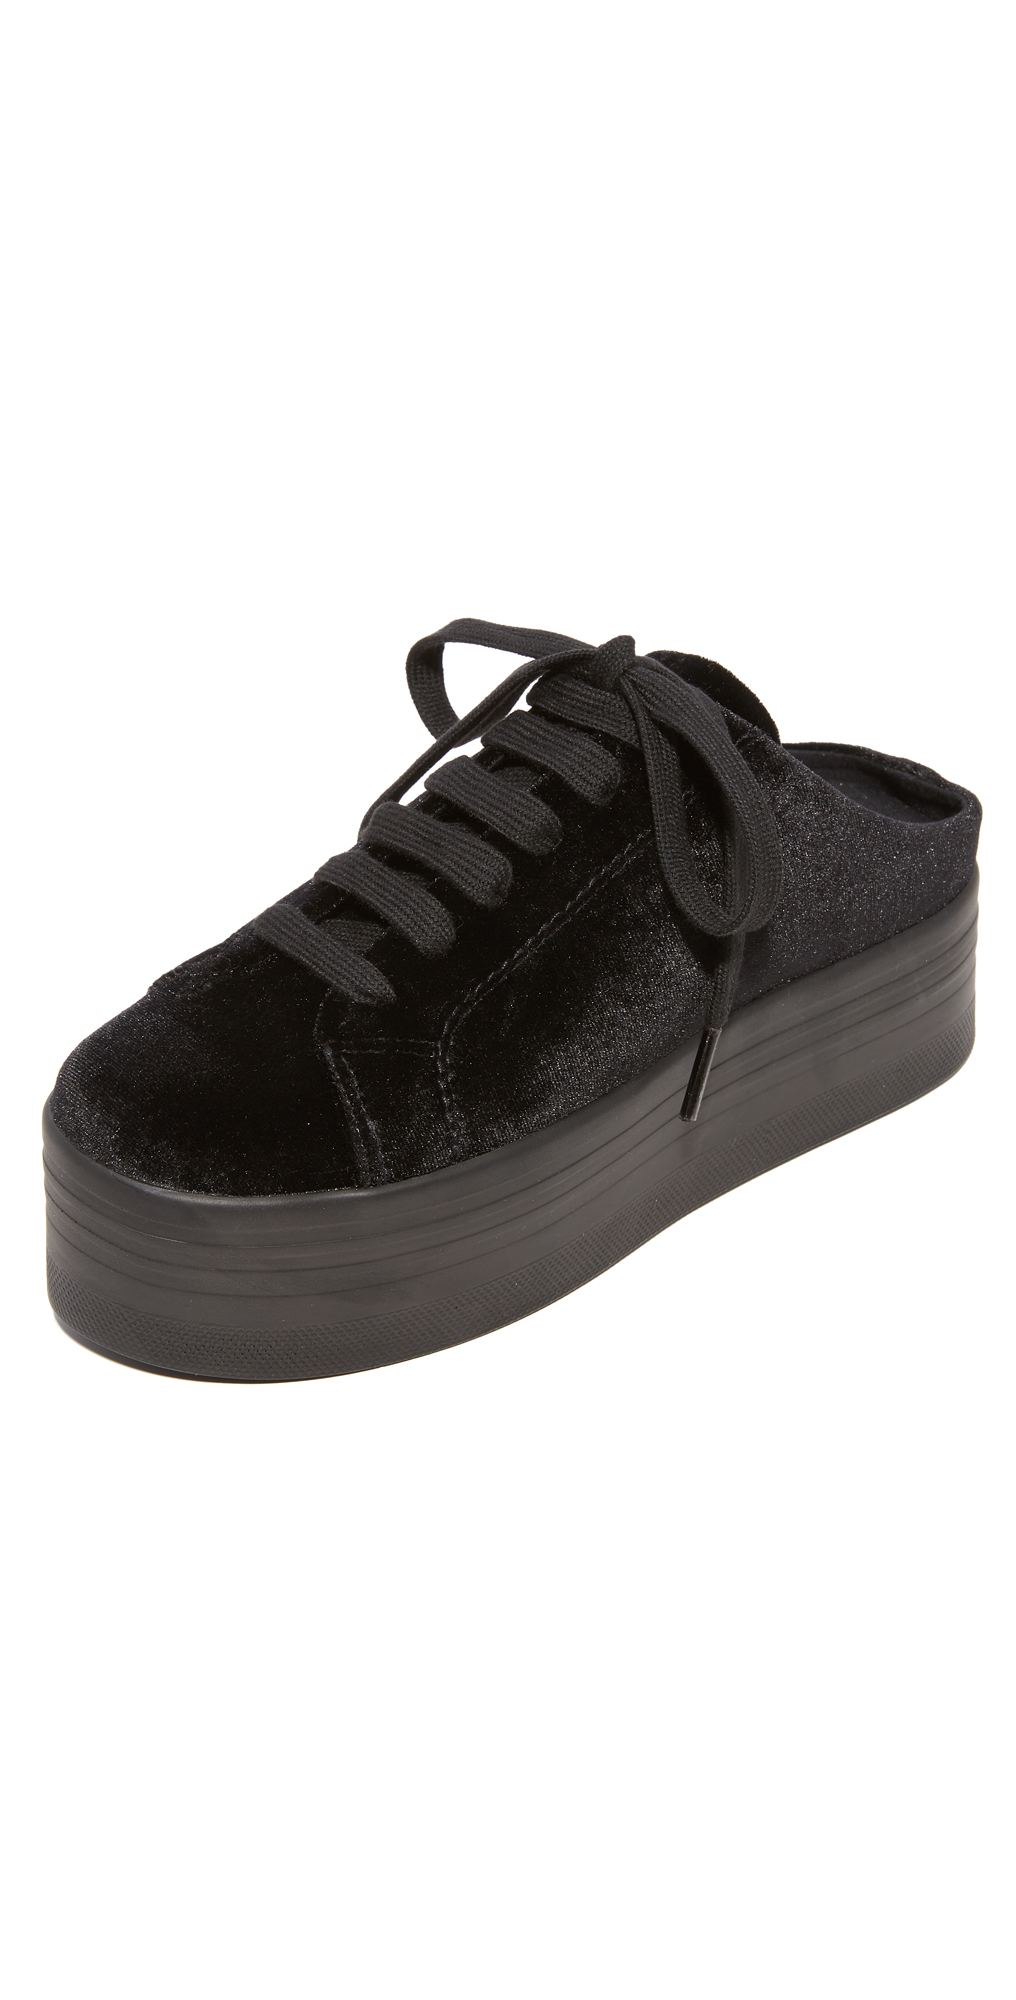 ZOMG Platform Sneaker Mules Jeffrey Campbell